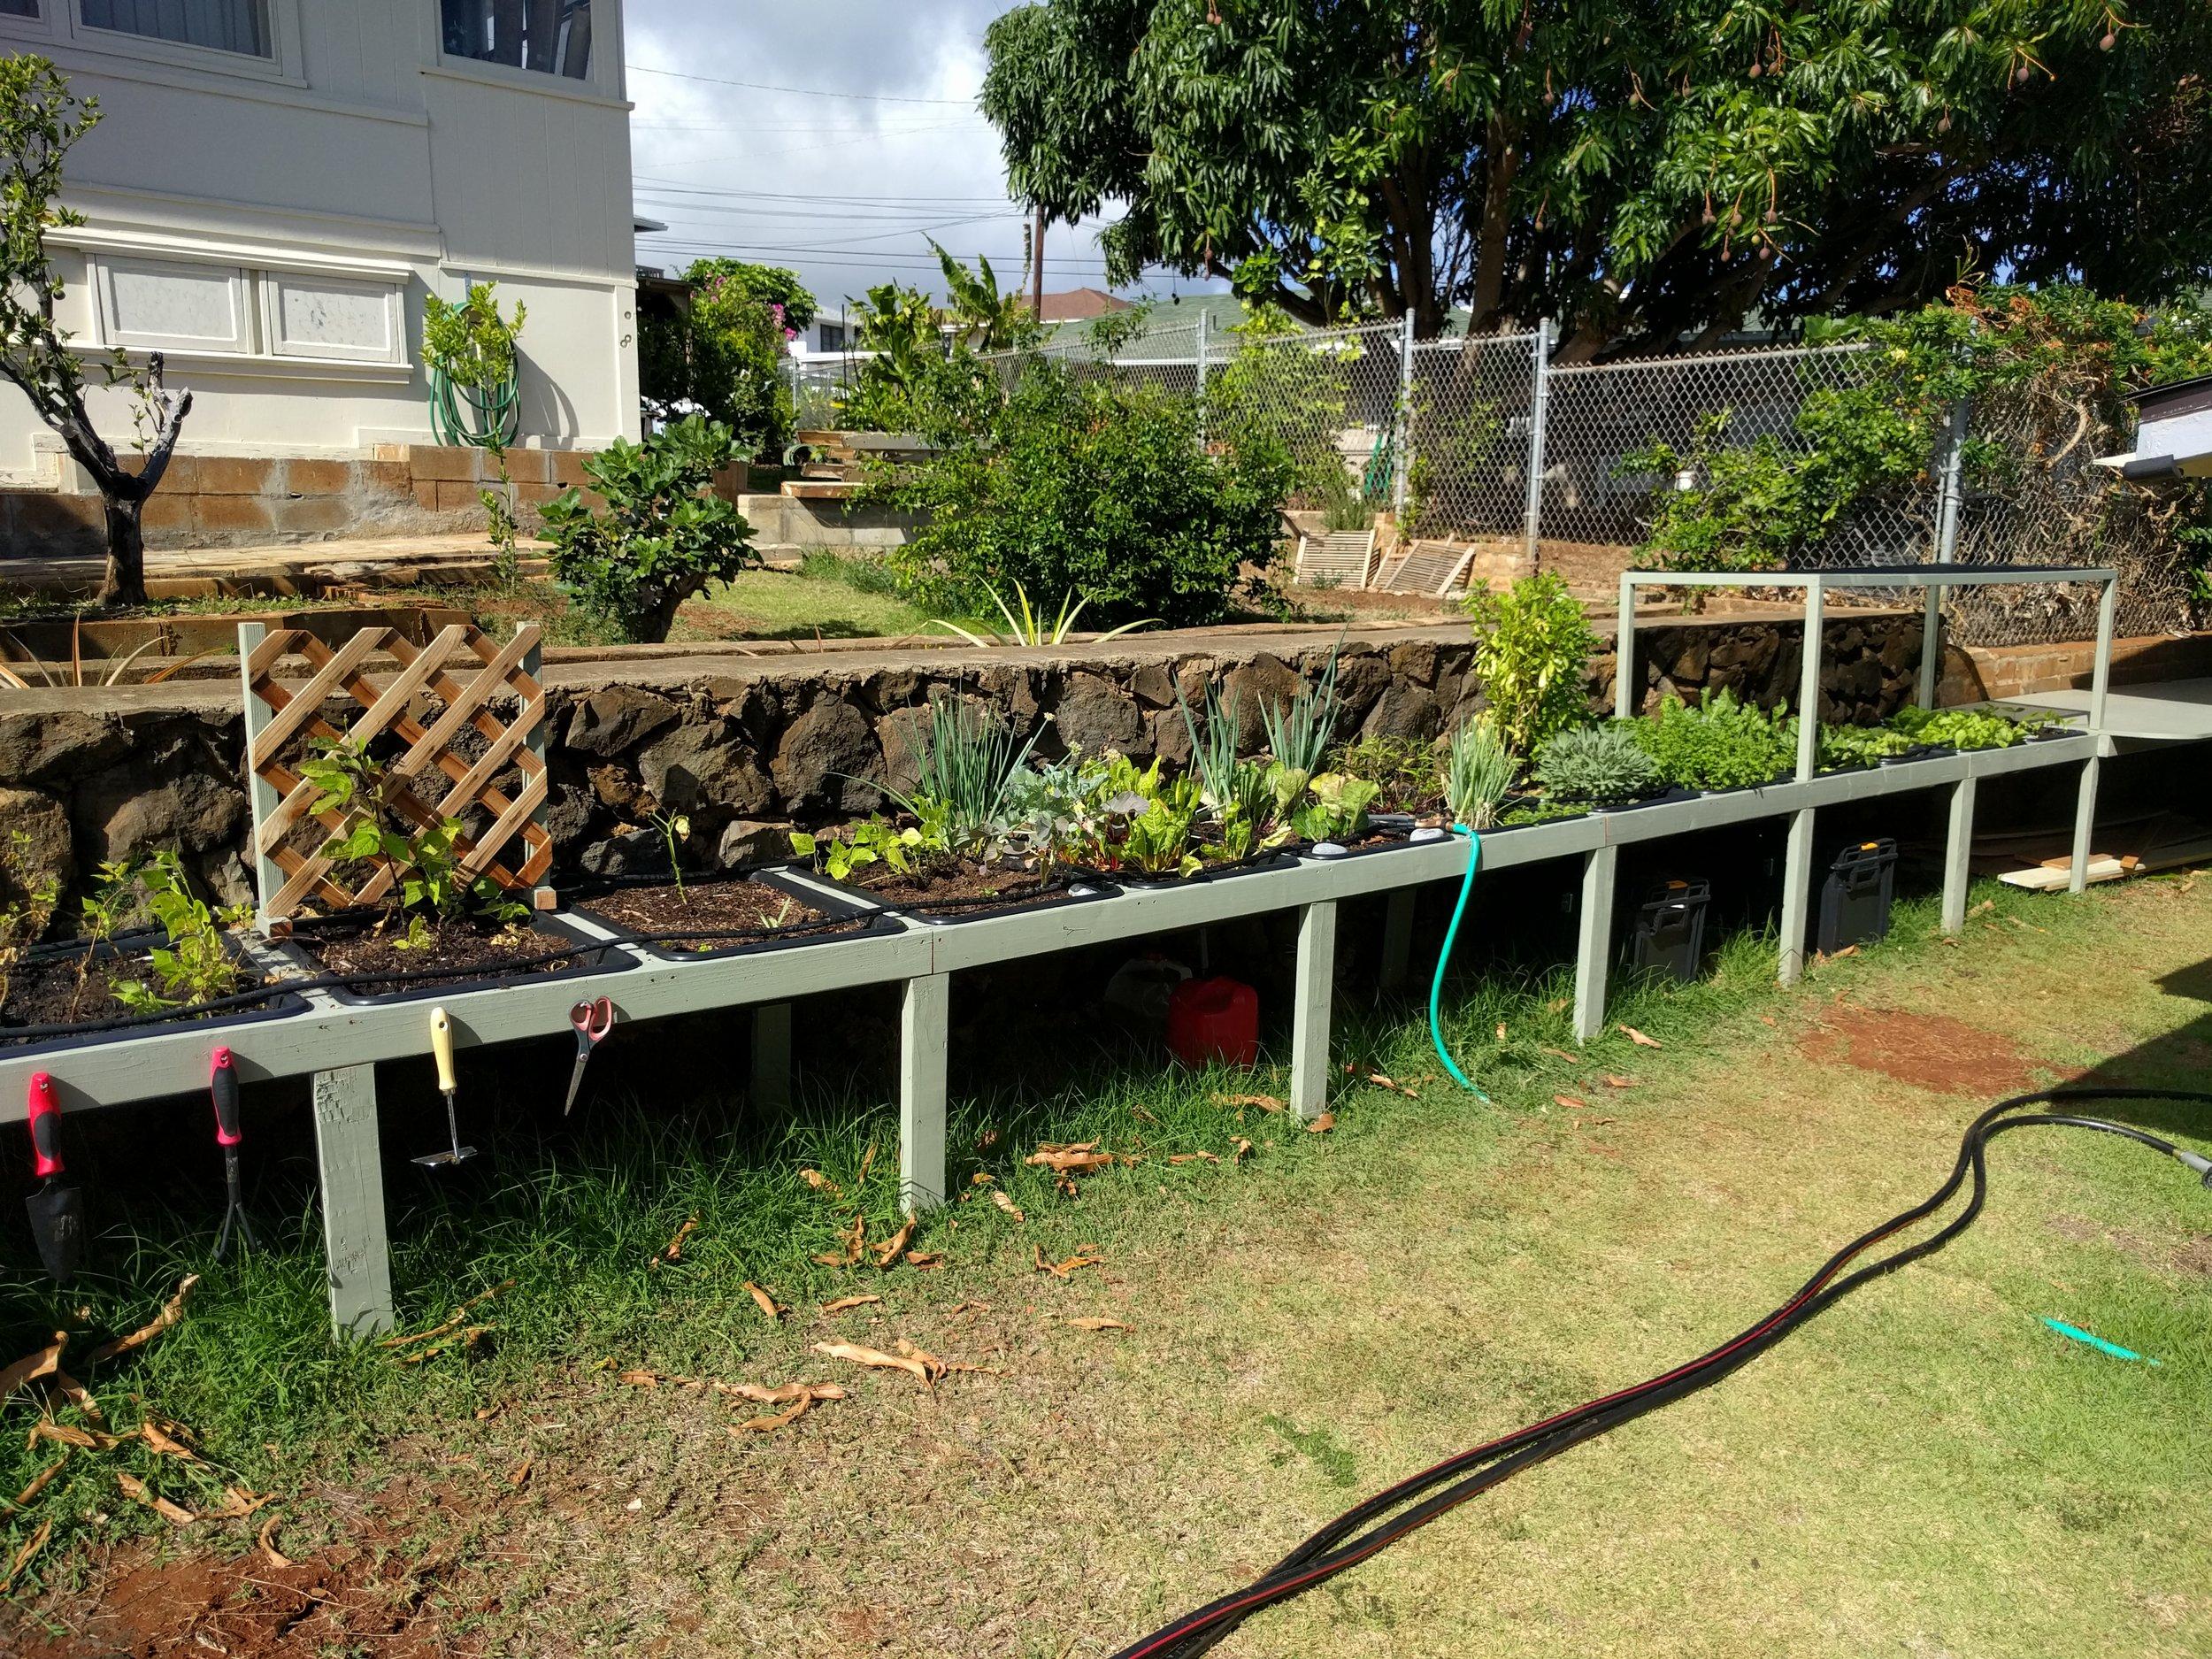 Garden in plumber boxes